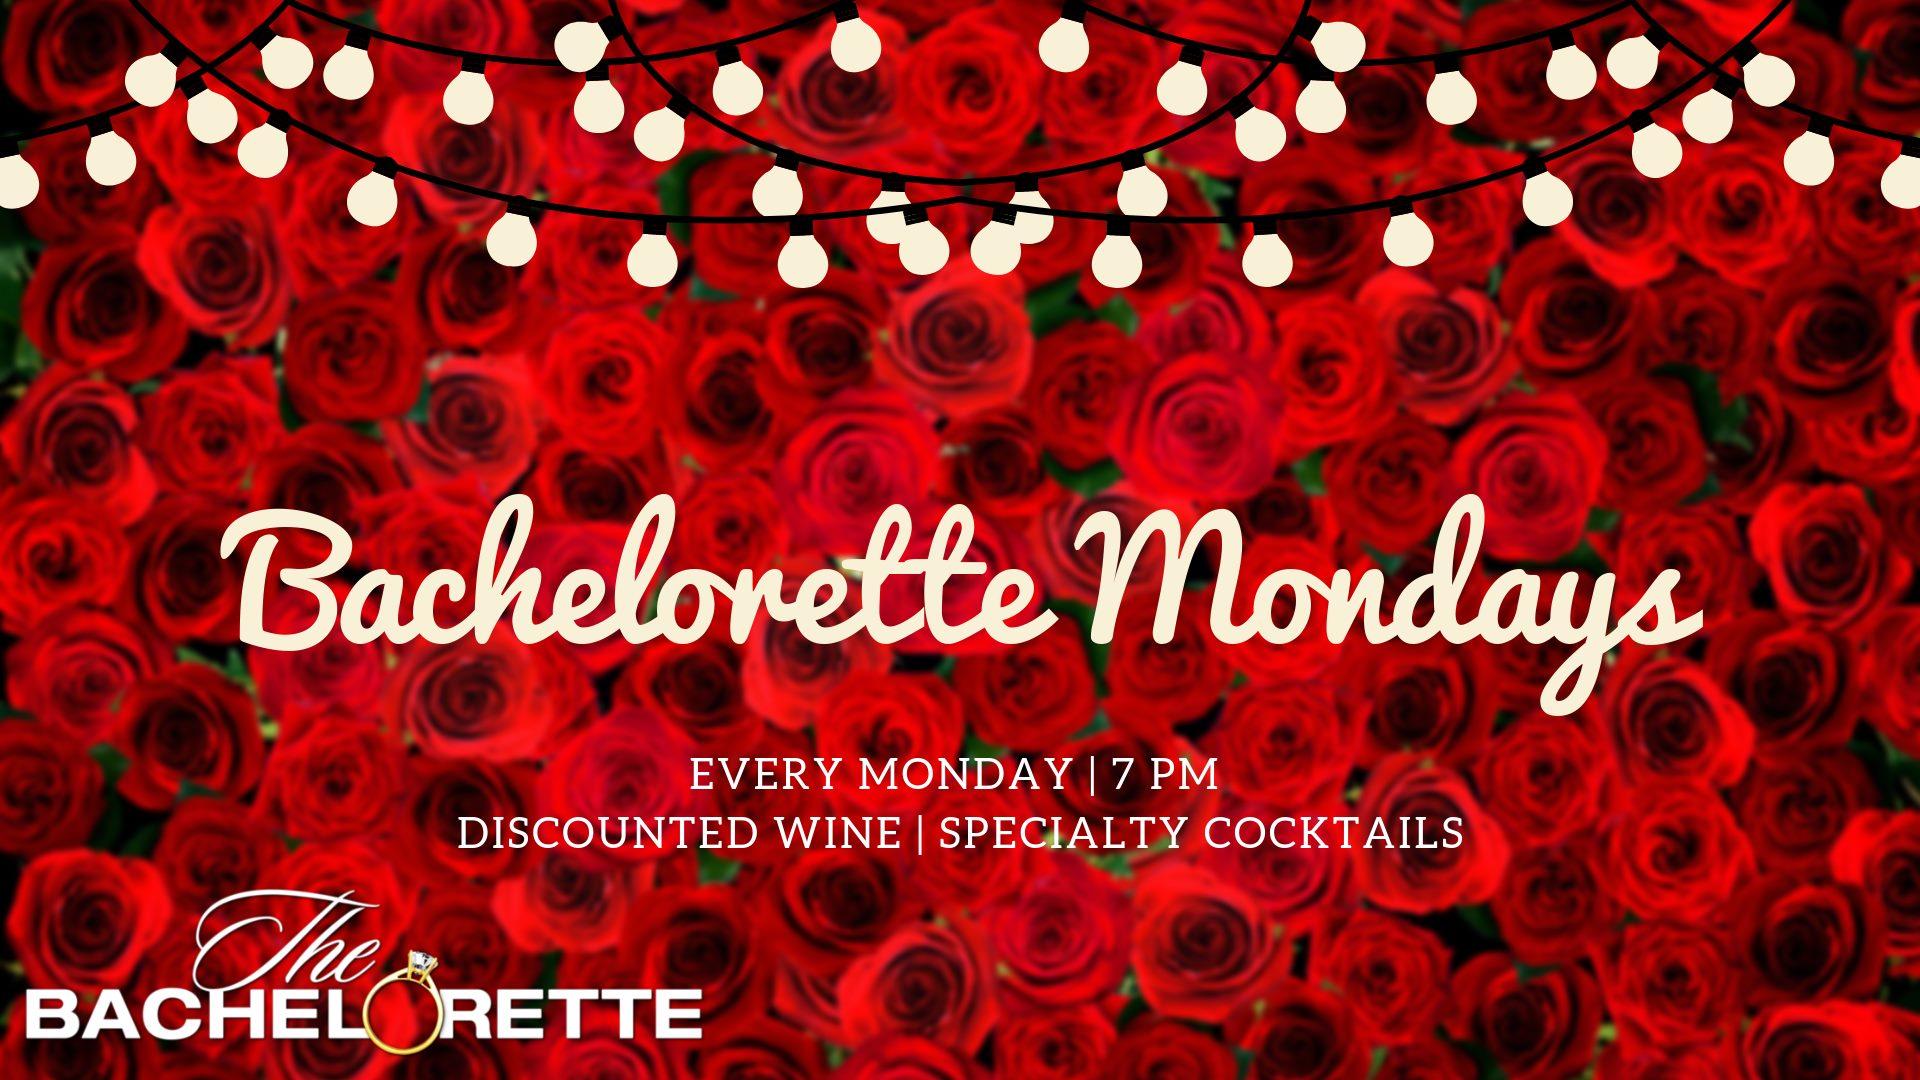 Bachelorette Mondays